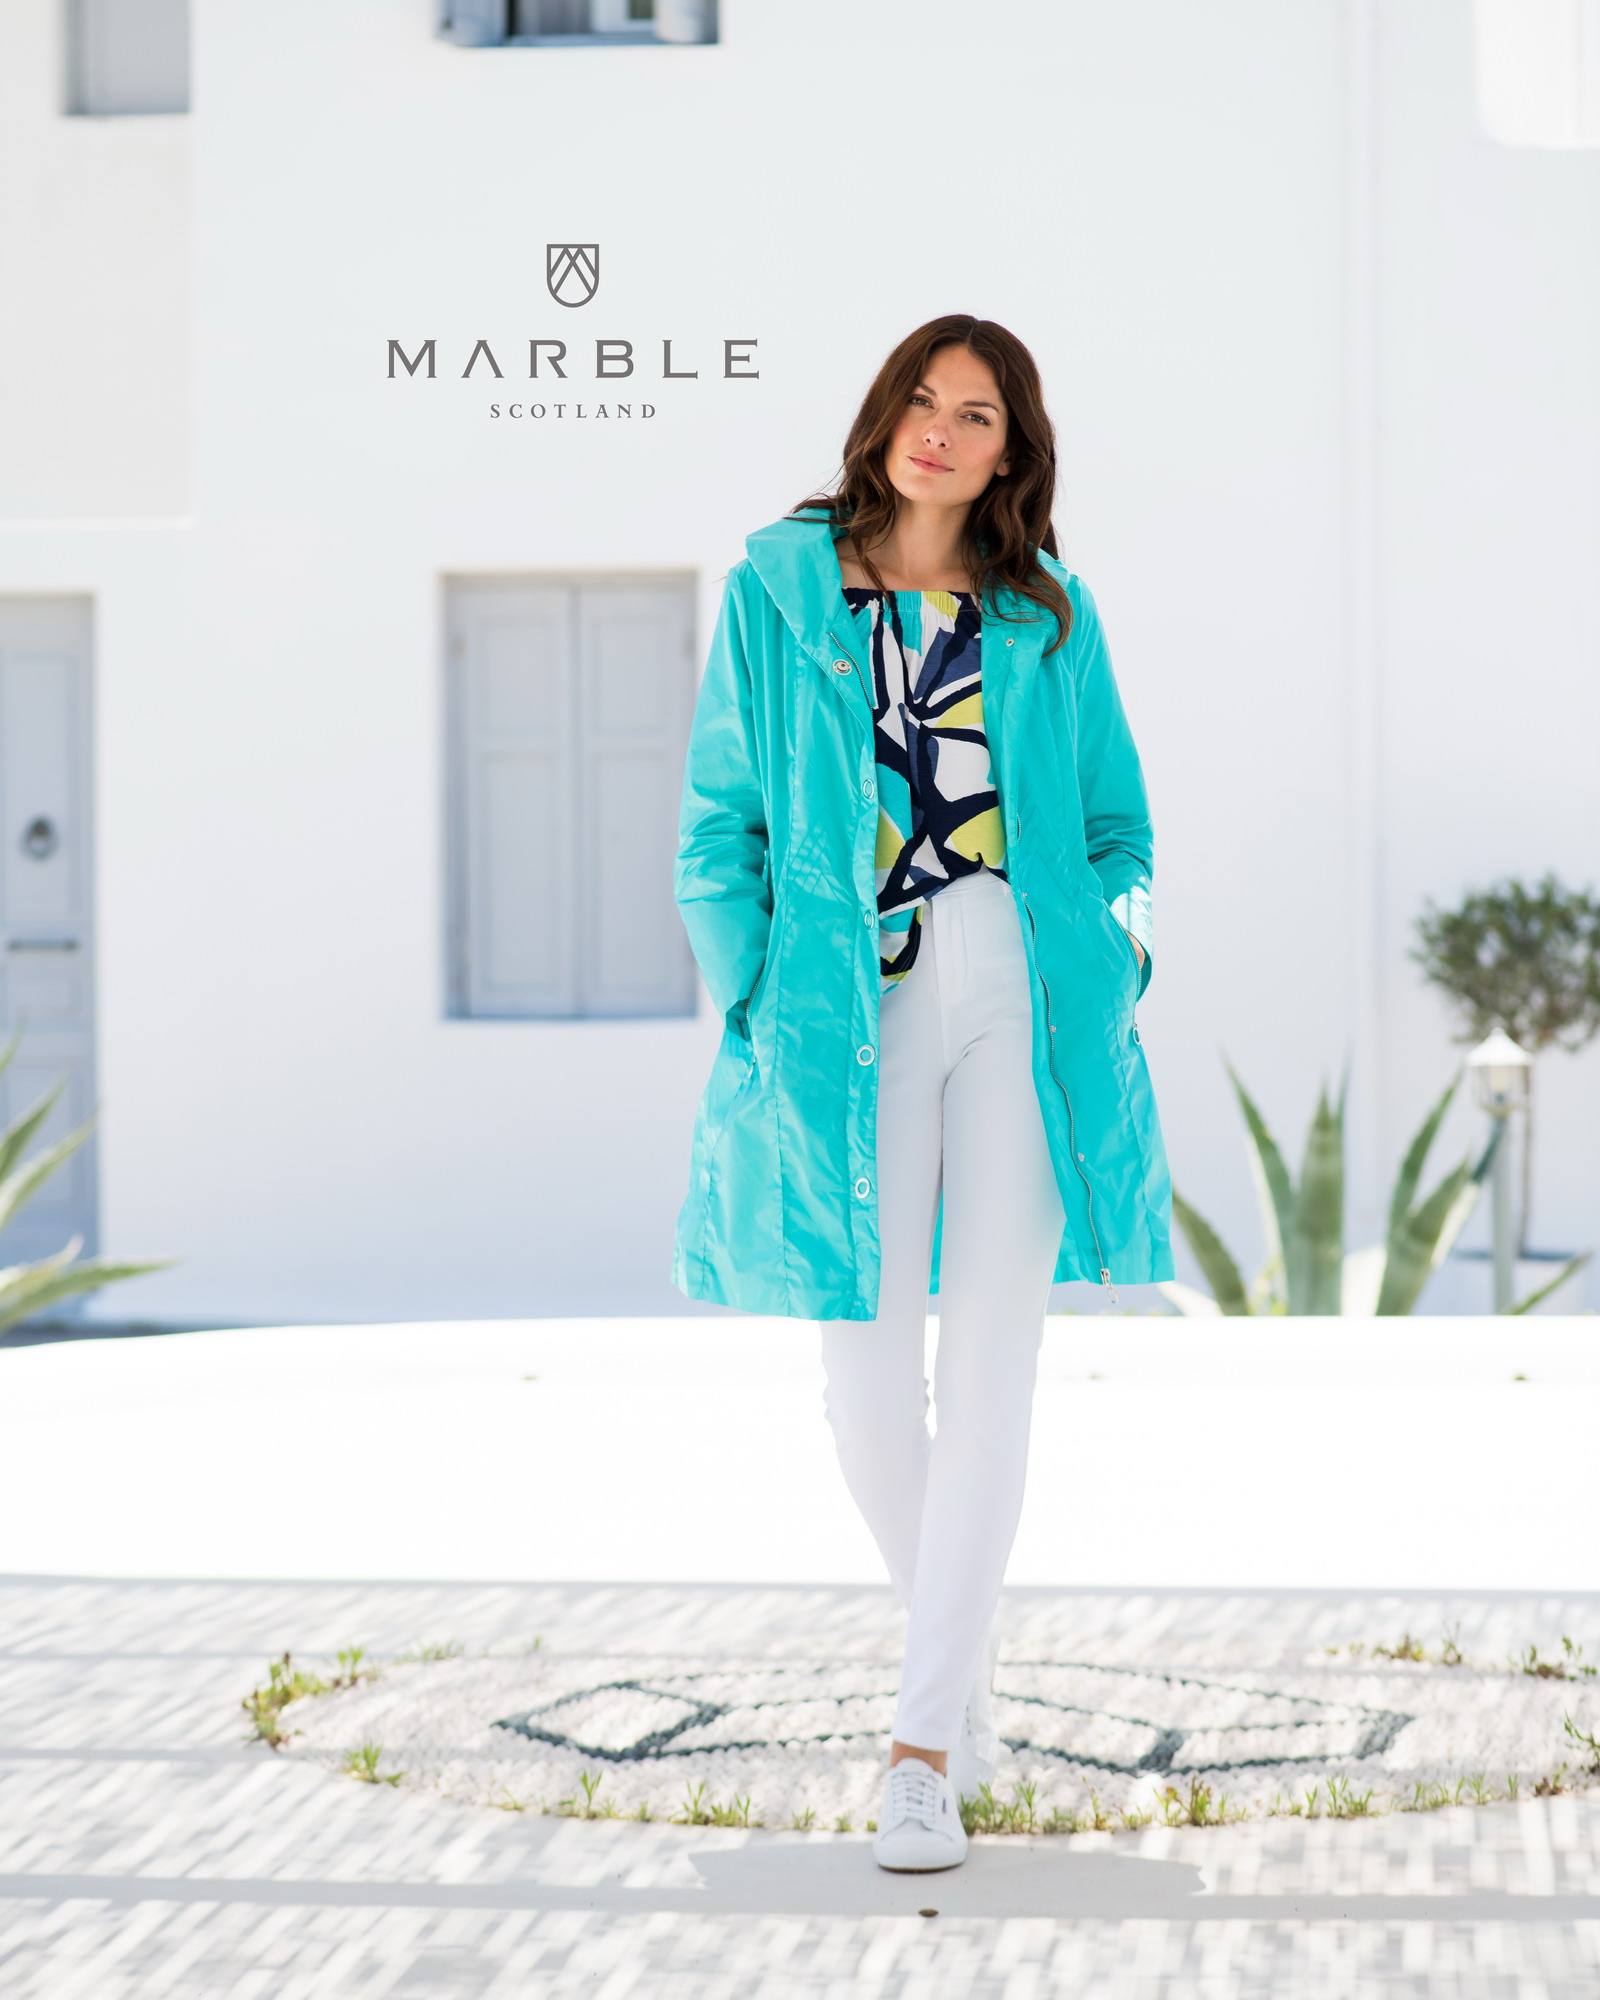 Marble – 5737 – (Colour 151)